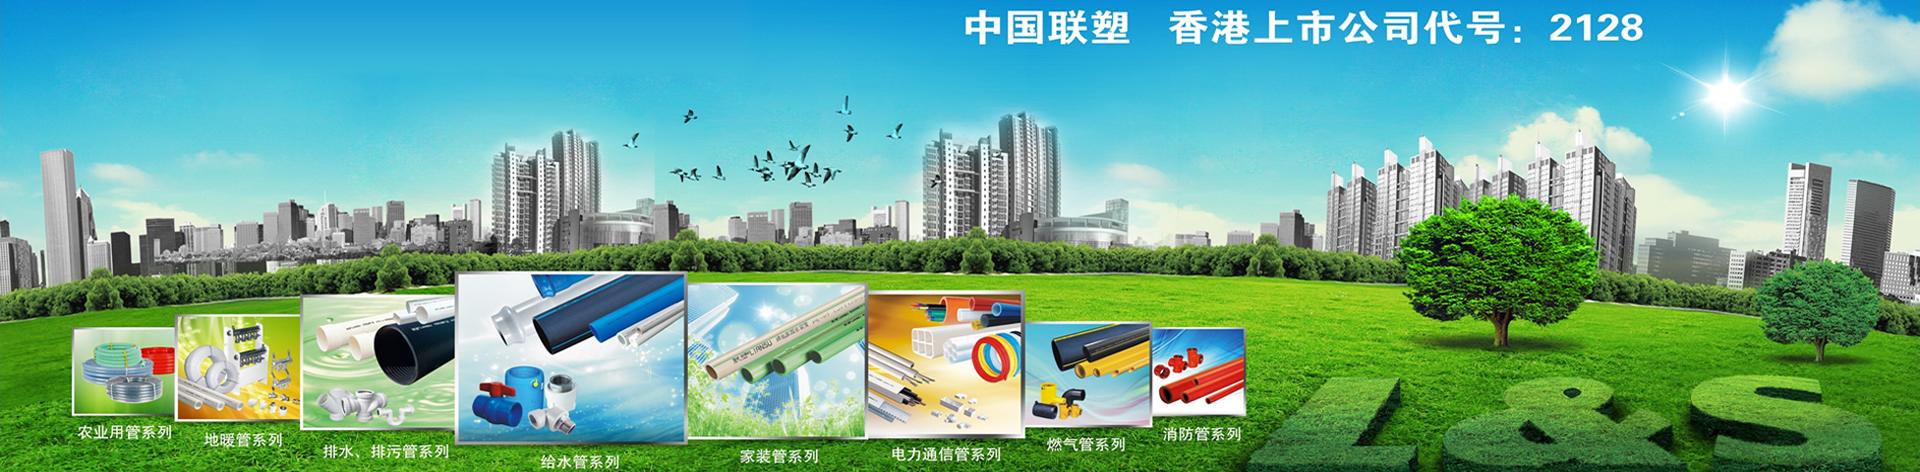 ppr给水管|PVC排水管|PVC线管